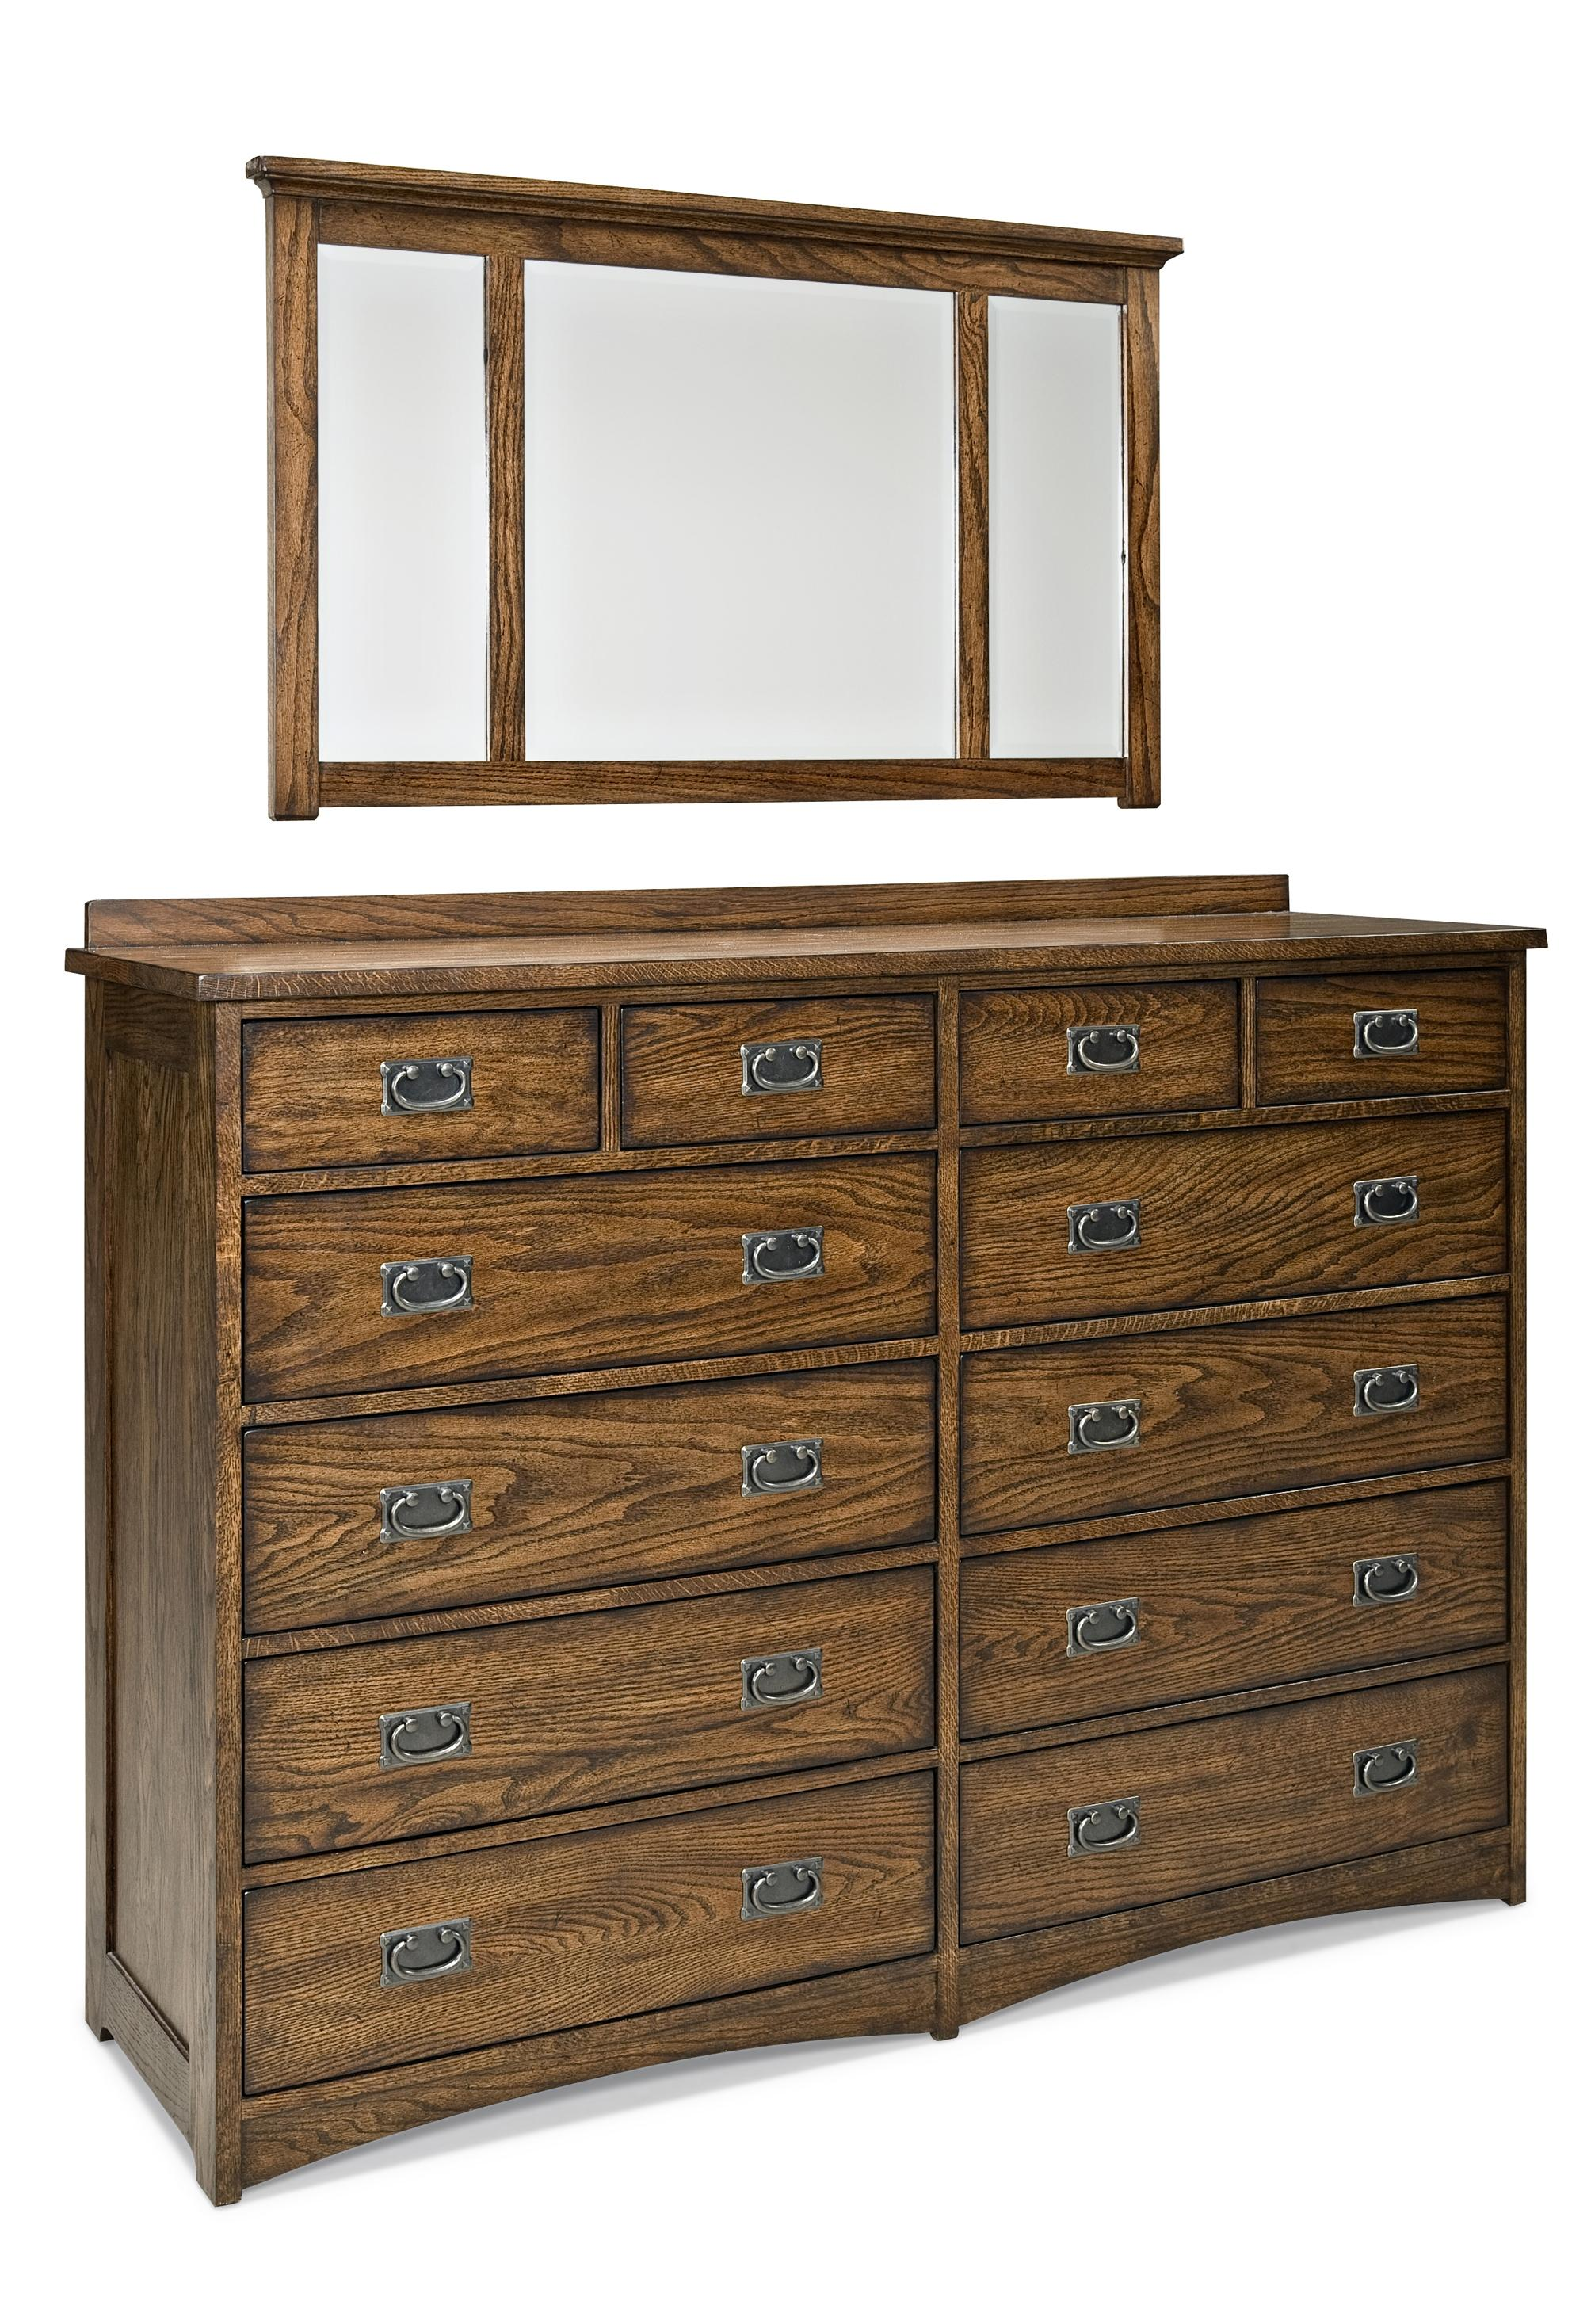 Oak Park Dresser and Mirror Set by VFM Signature at Virginia Furniture Market